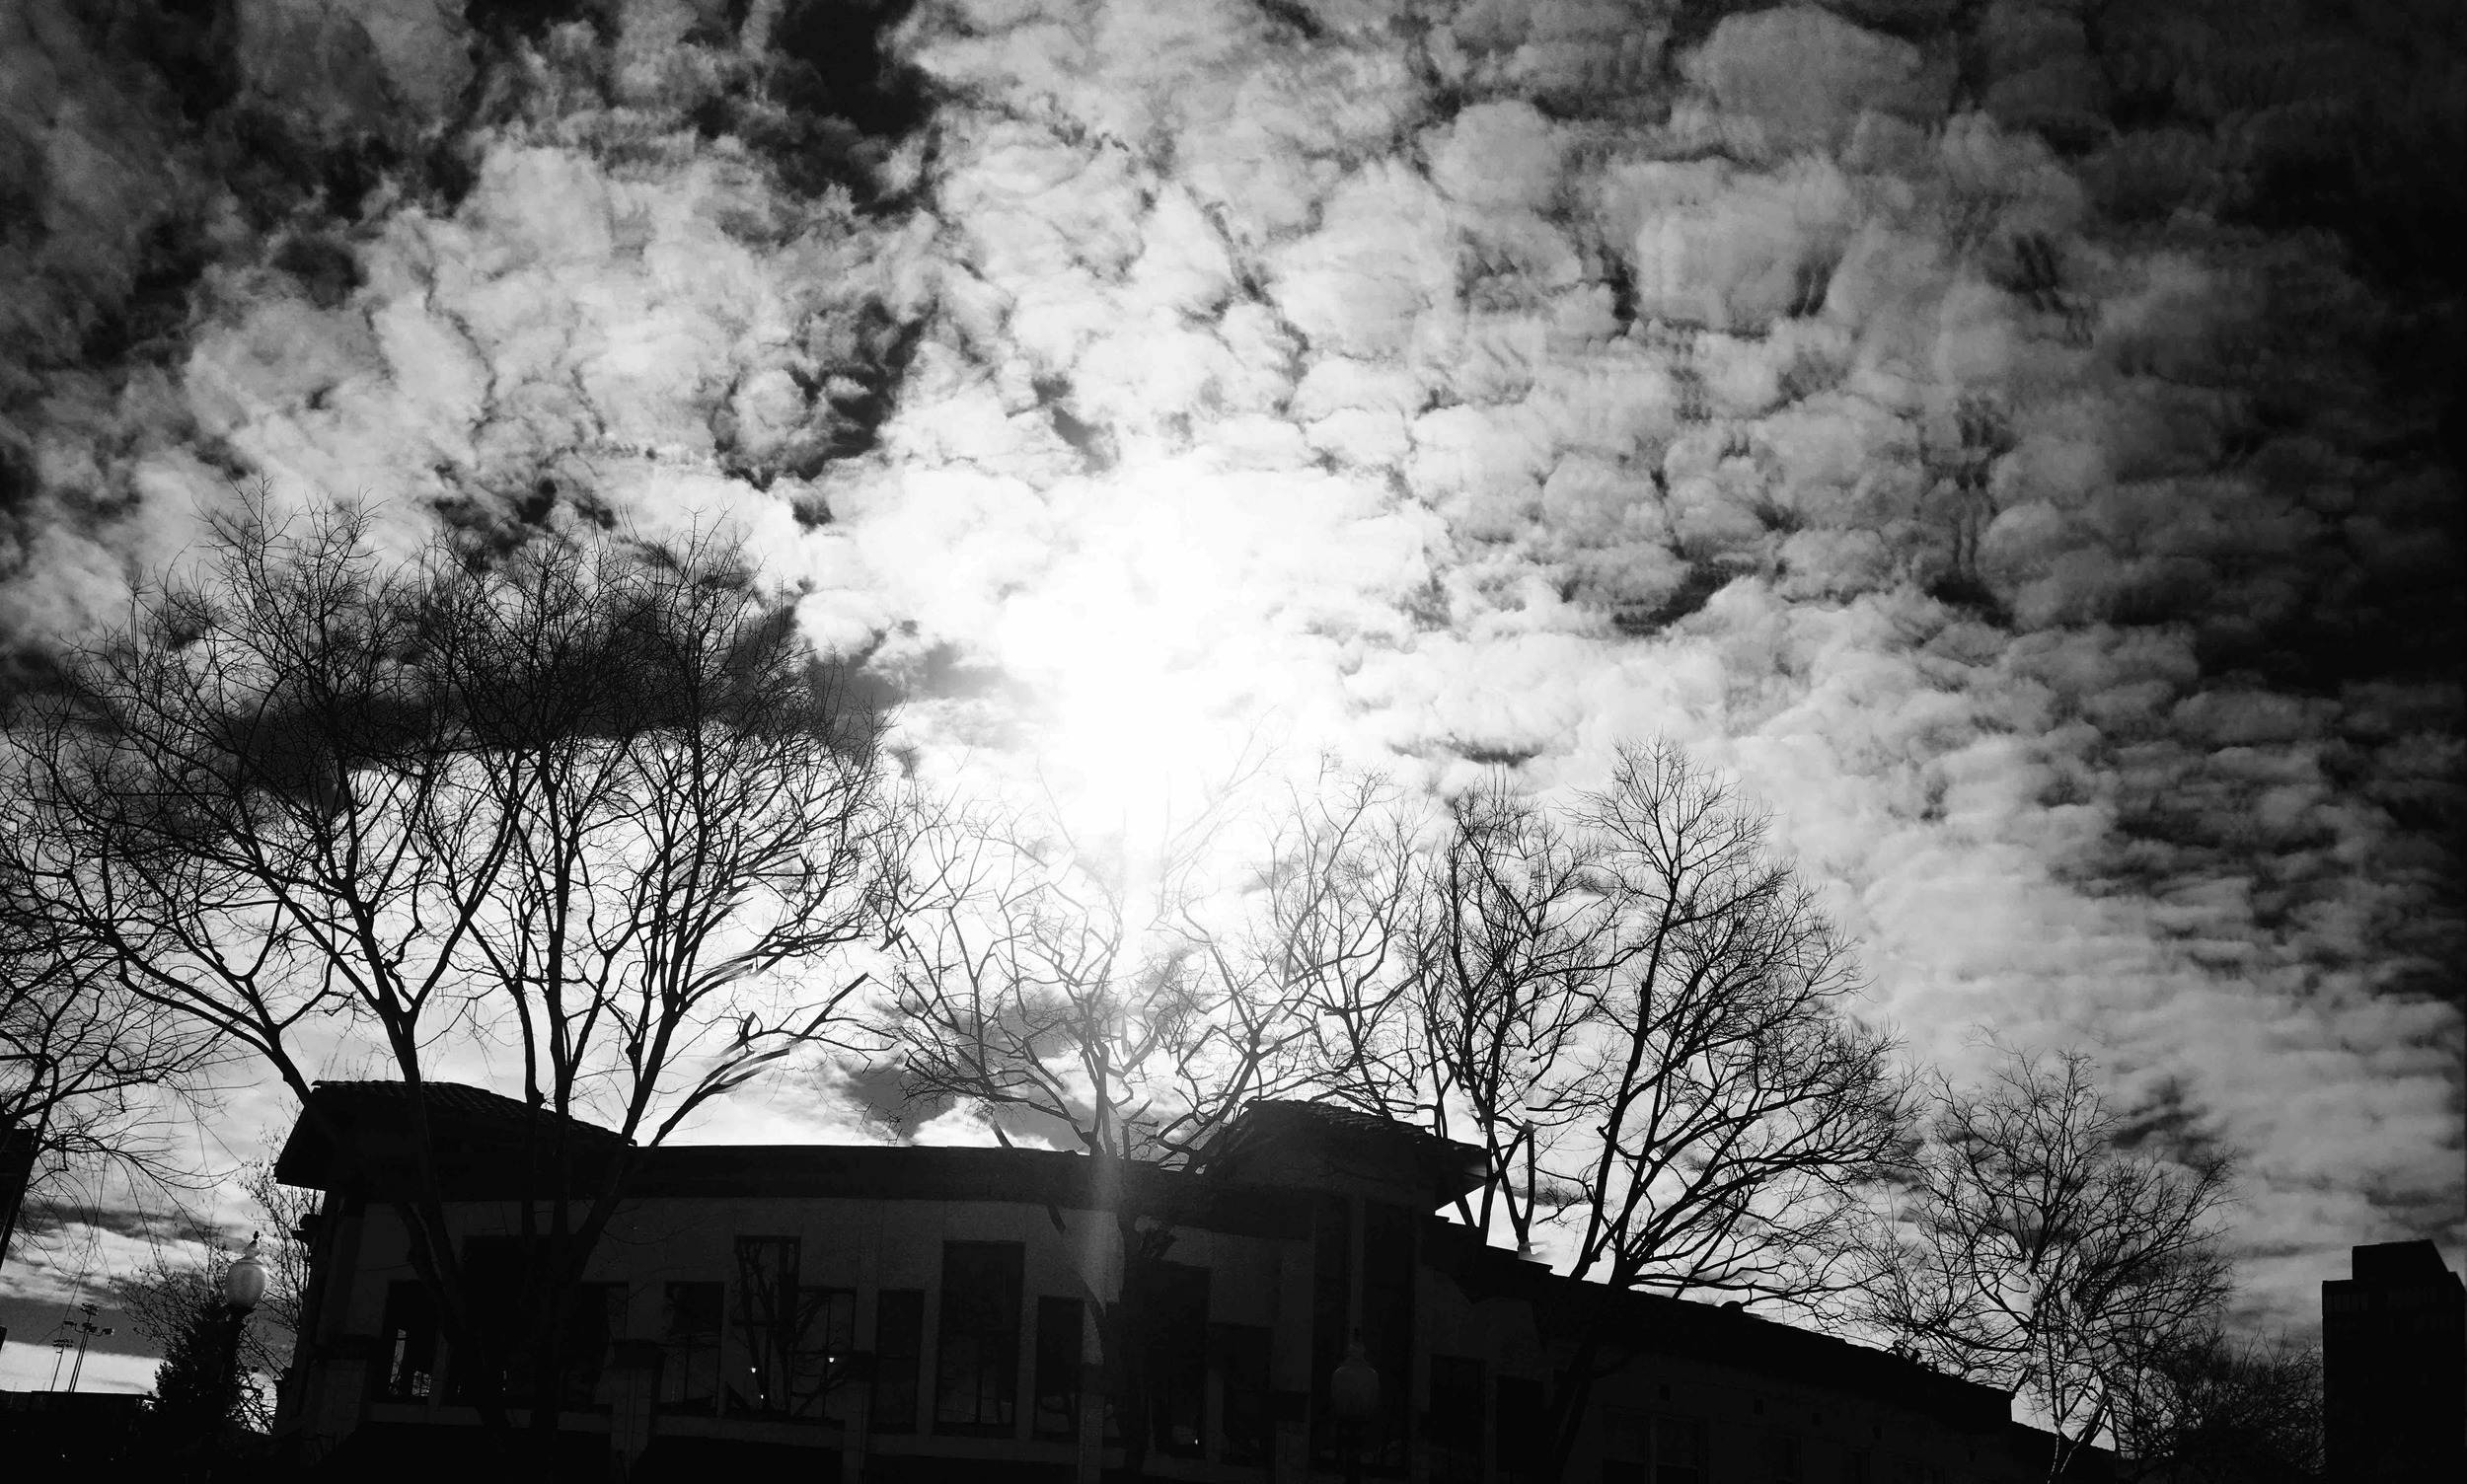 Berkeley Pan_4  Photograph, 30 January, 2016;  Copyright © Tennyson Woodbridge, 1963 to present